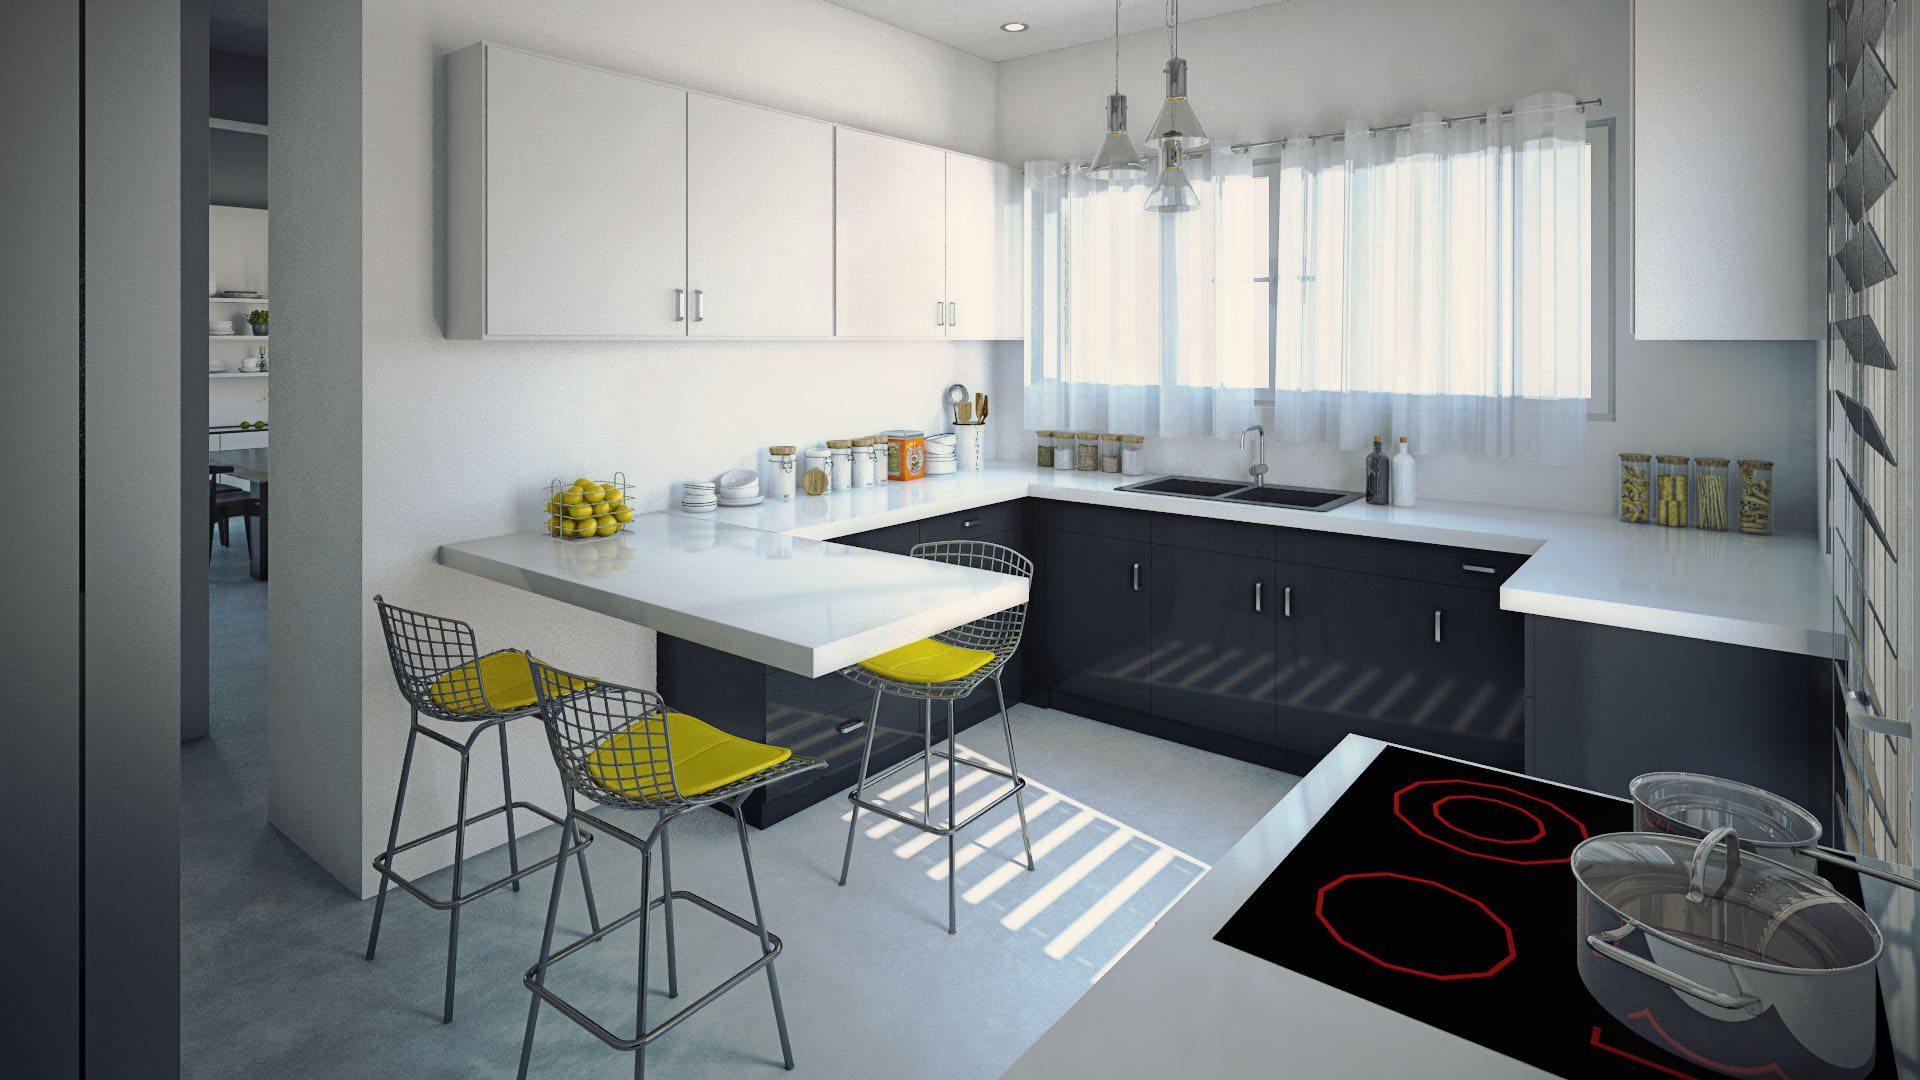 archicostudio_oreokastro_h1_kitchen